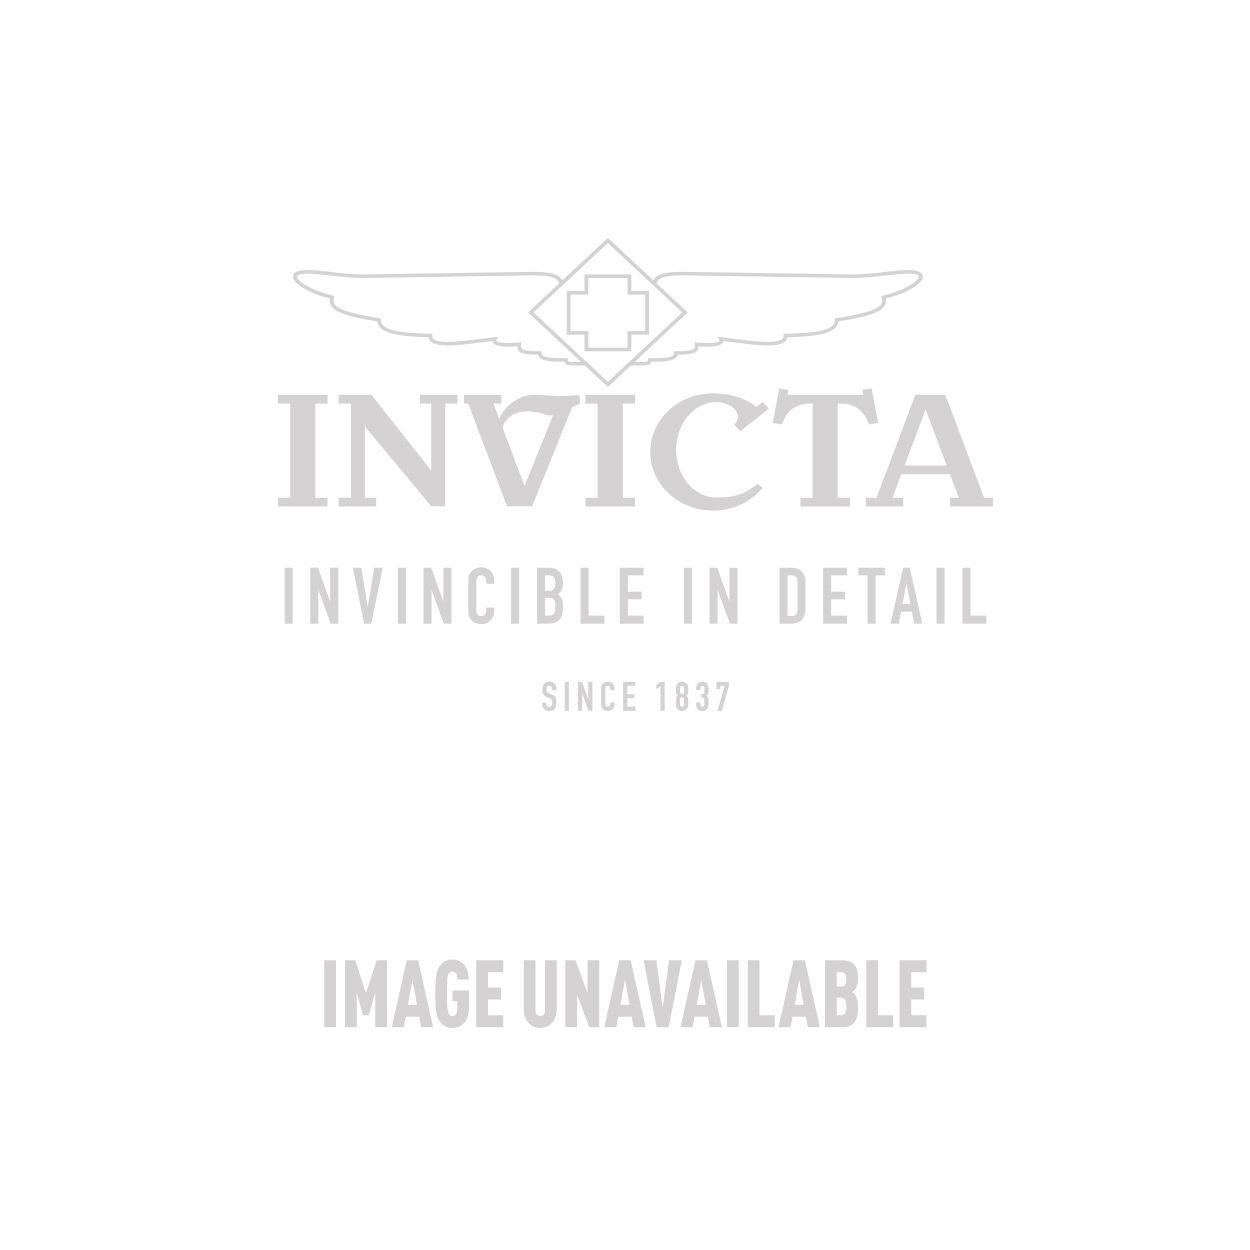 Invicta Corduba  Quartz Watch - Black, Gunmetal case with Black tone Polyurethane band - Model 90228